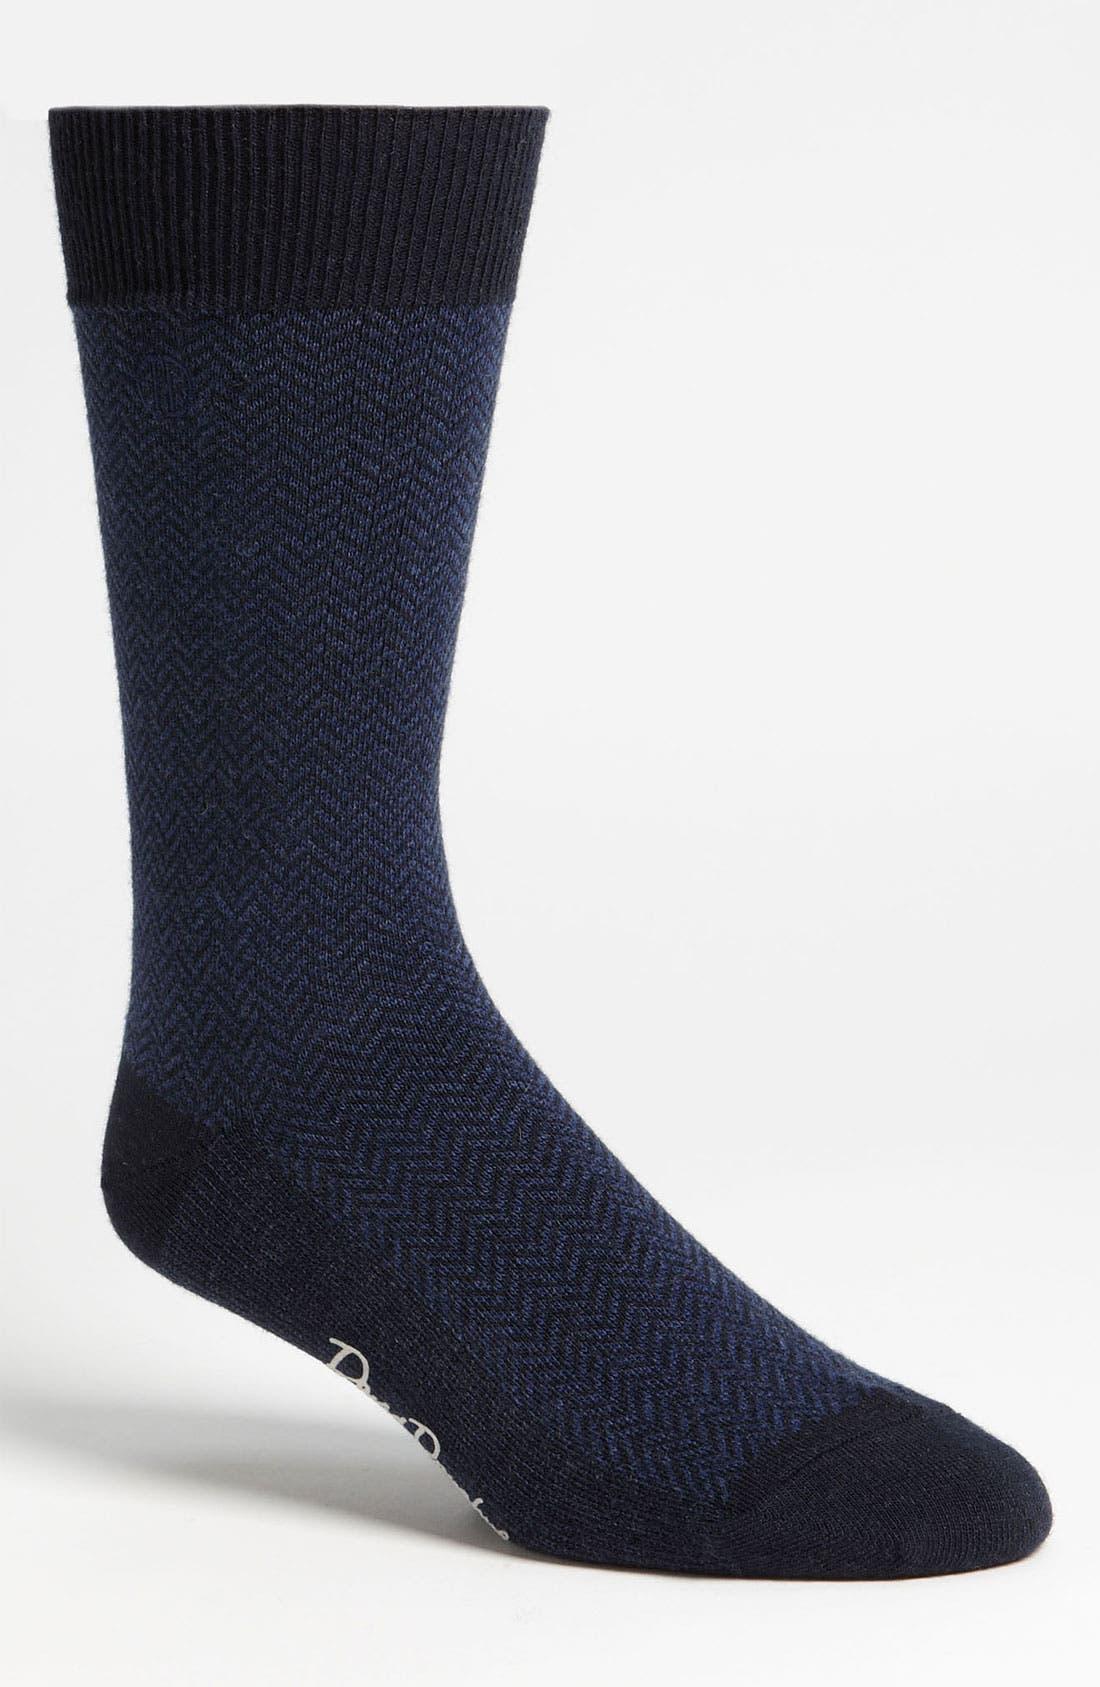 Alternate Image 1 Selected - David Donahue Wool Blend Socks